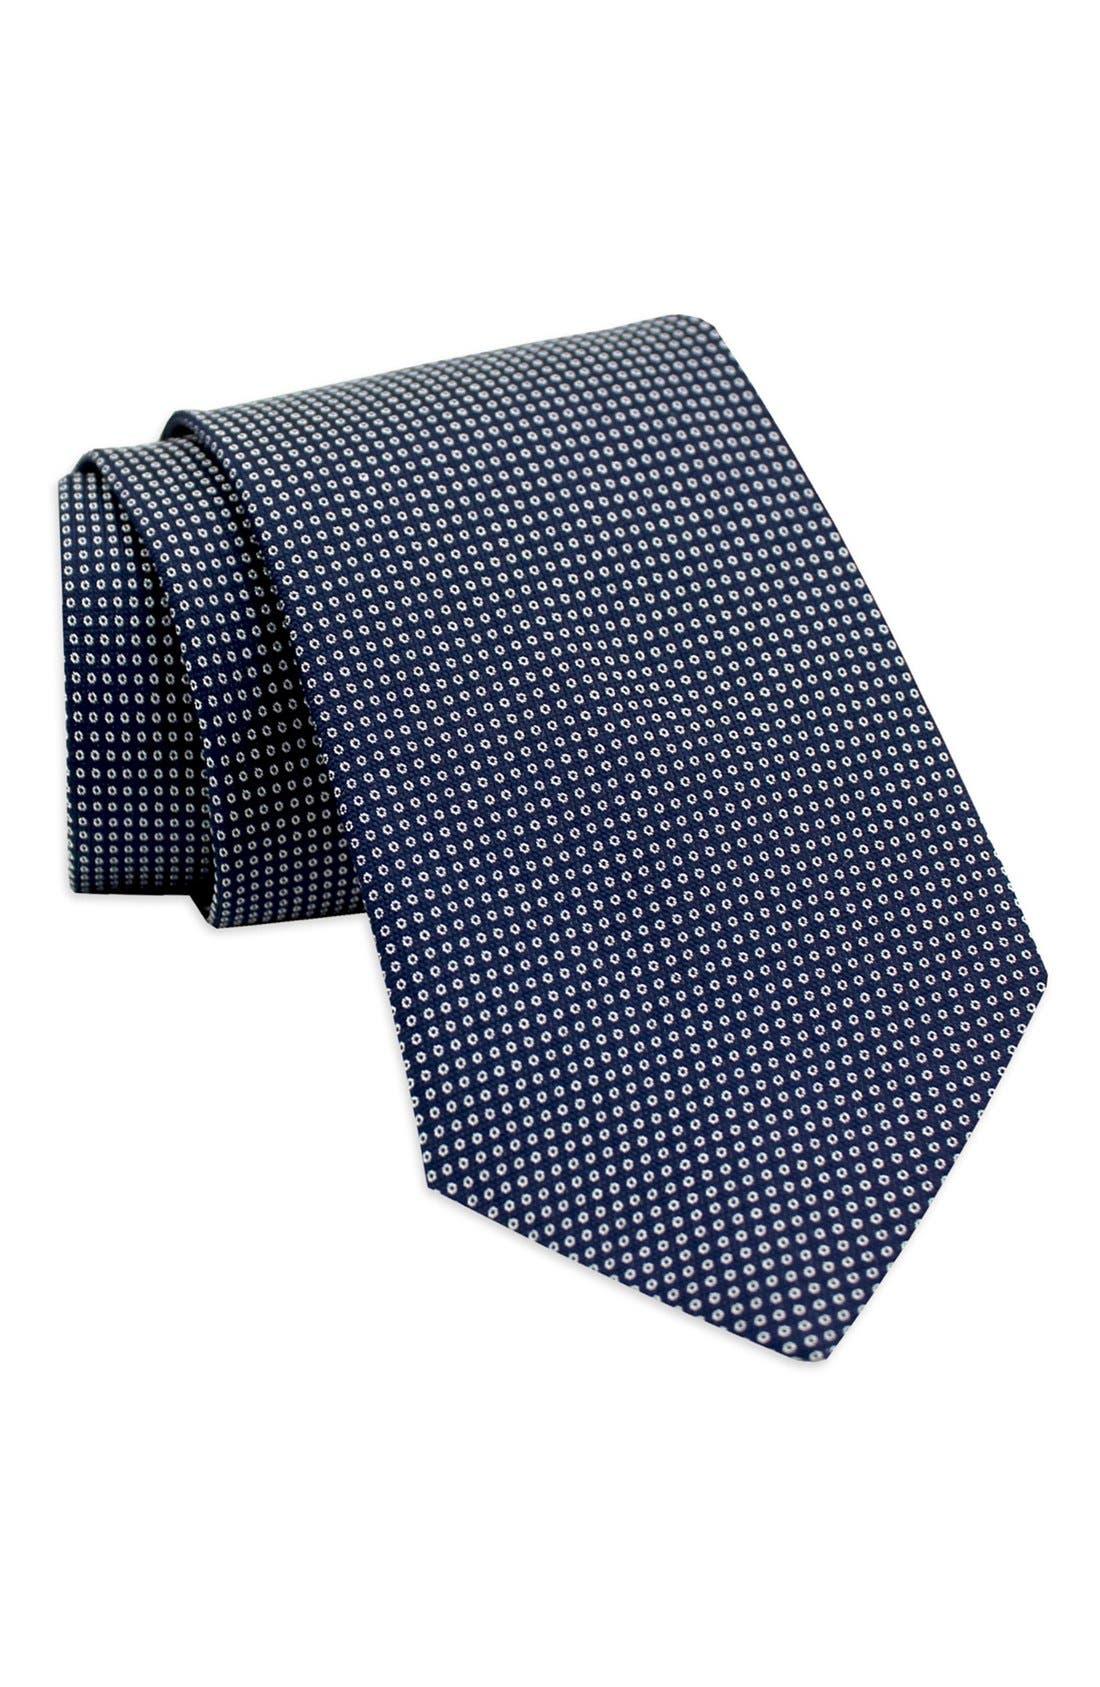 Alternate Image 1 Selected - Gitman Dot Silk Tie